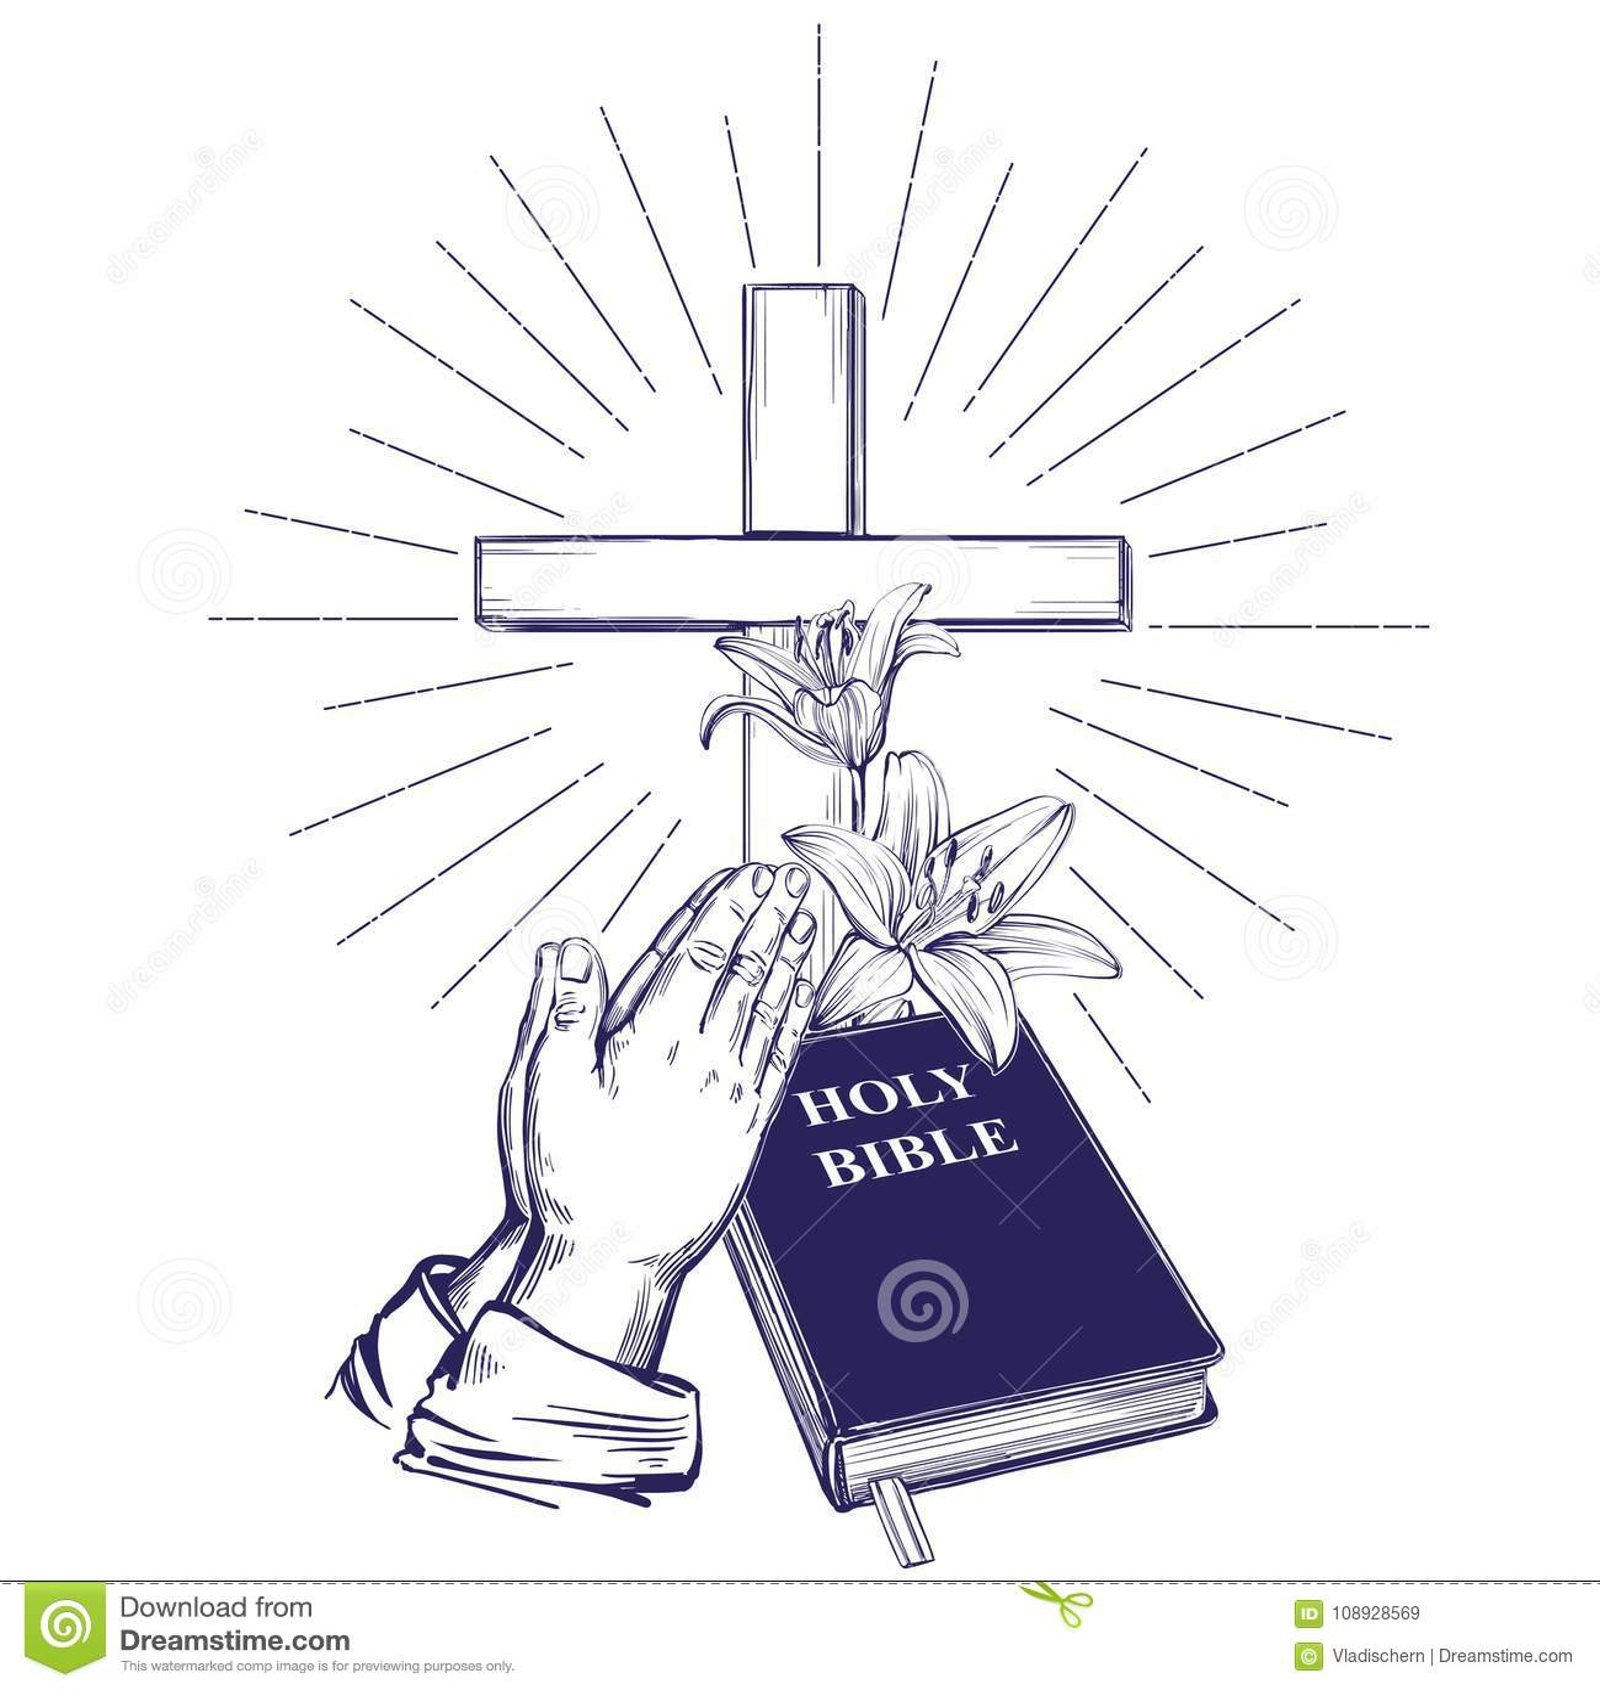 Praying Hands Bible Gospel Crown Of Thorns Wooden Cross Easter